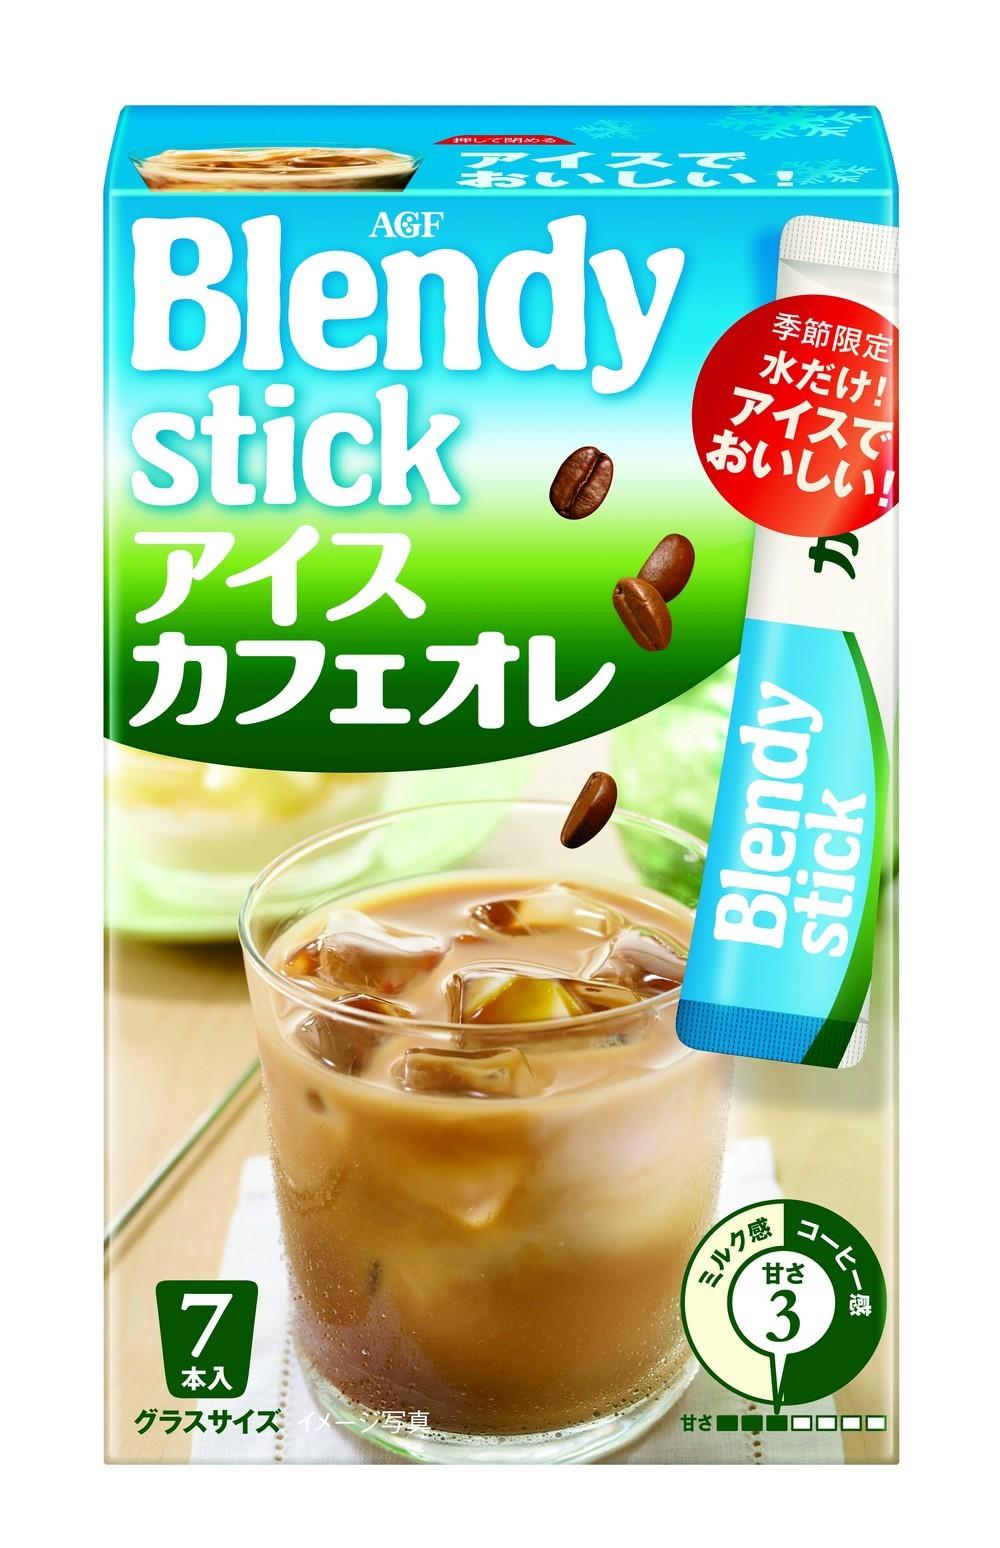 AGFの「Blendy」を無料で提供